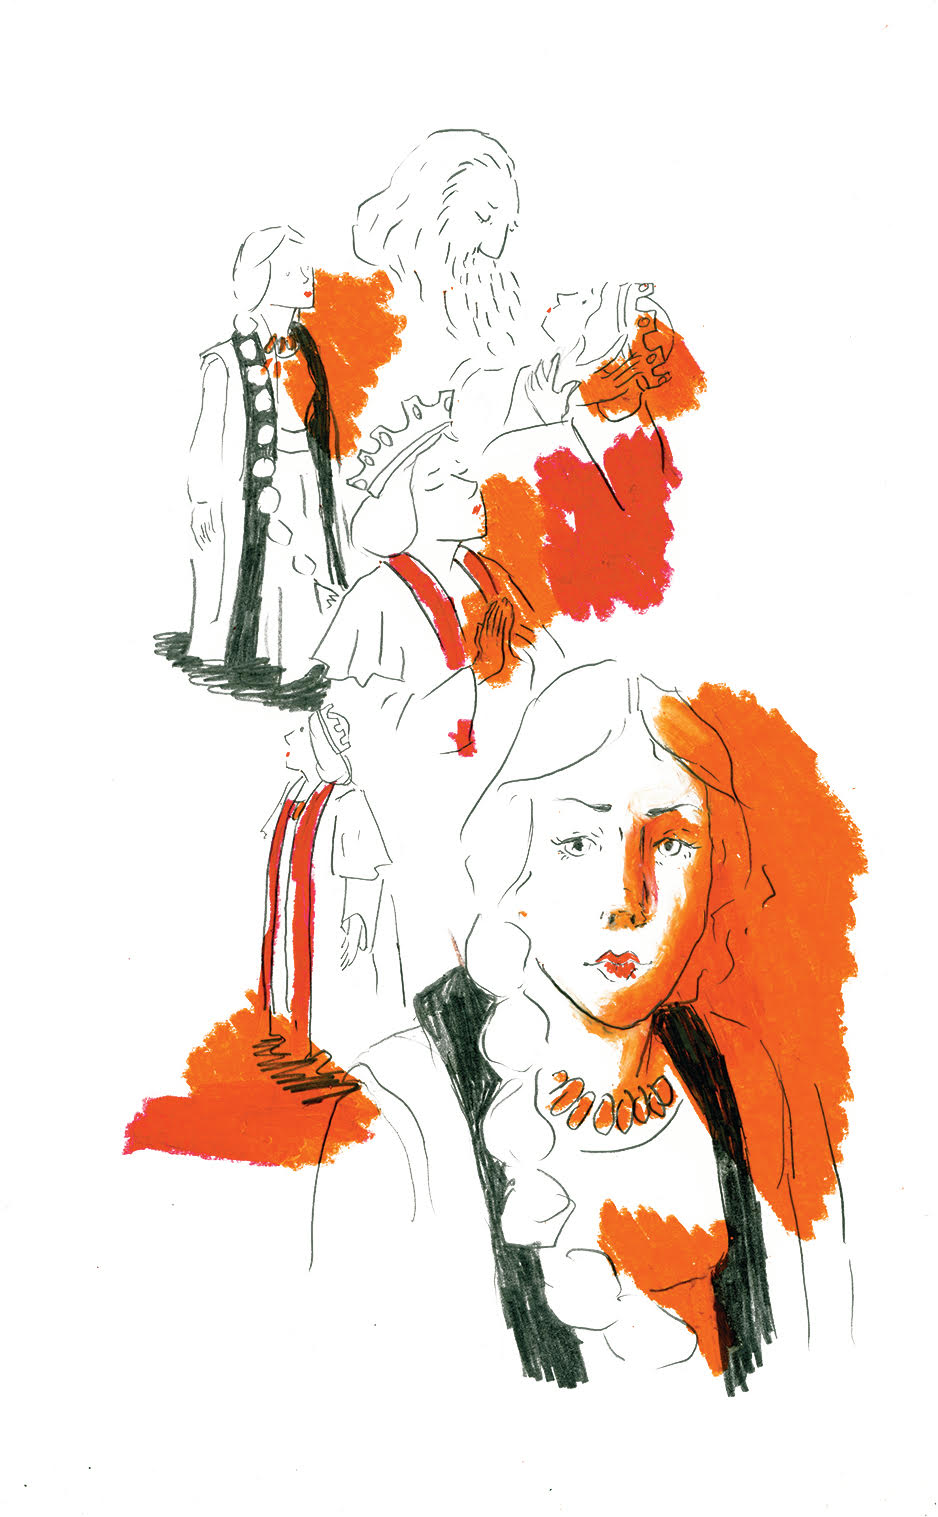 Illustration Burcu Türker